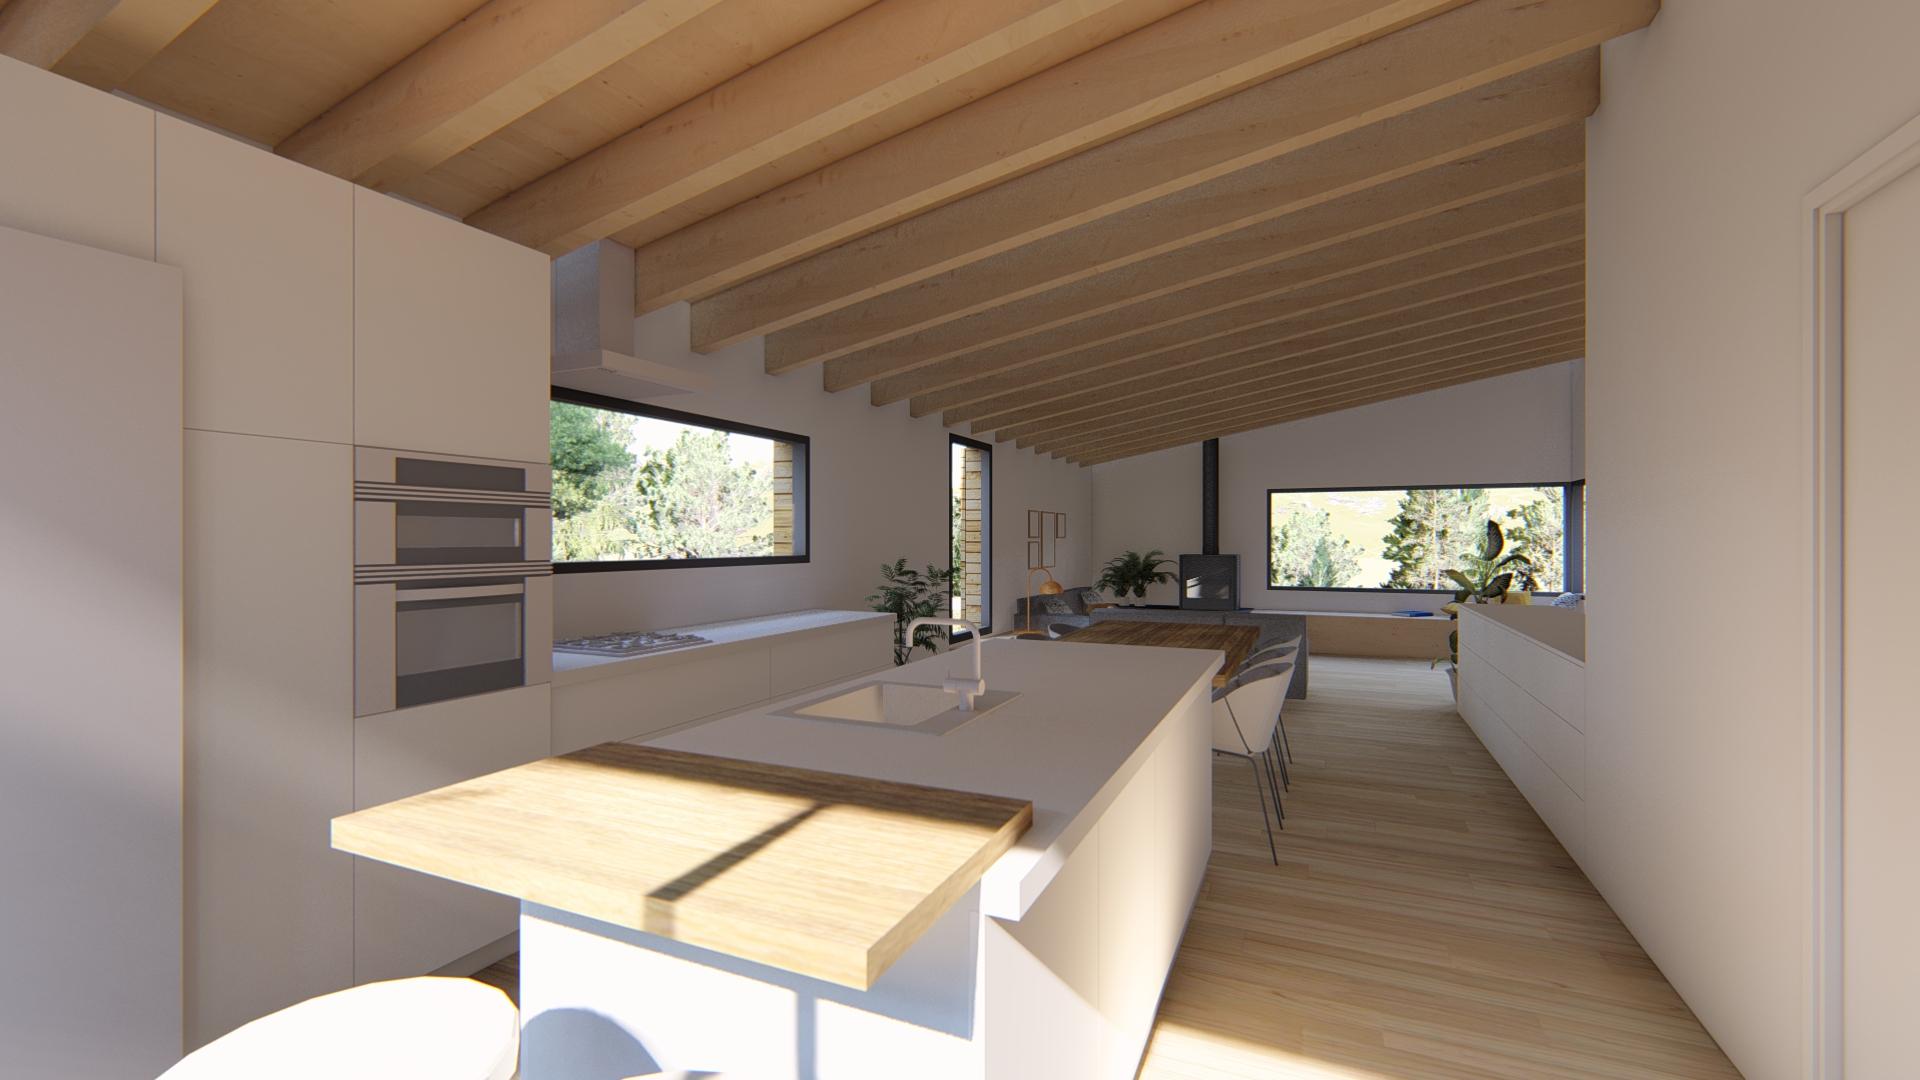 Rellinars interior 2